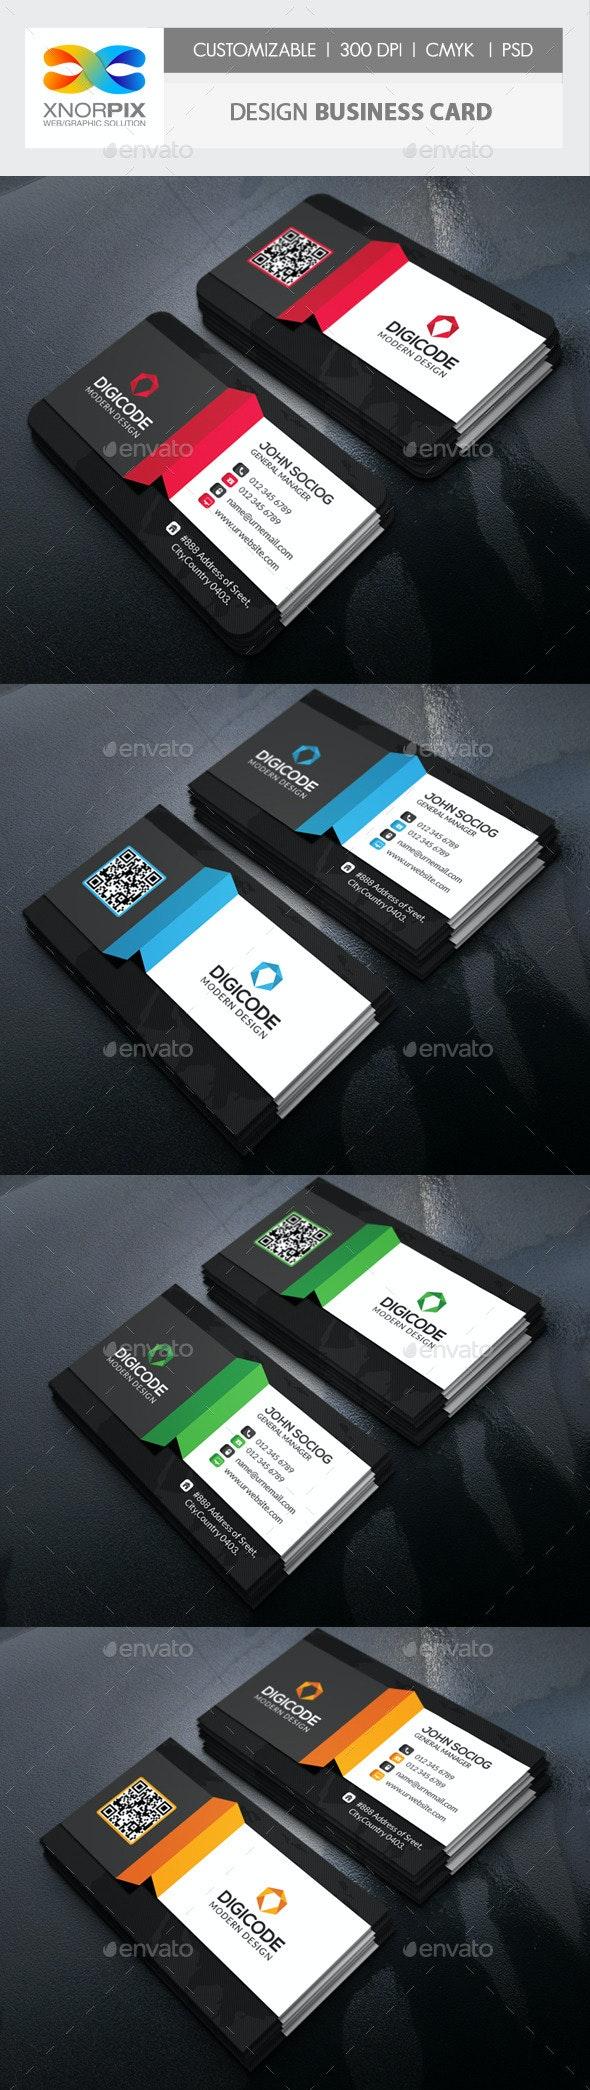 Design Business Card - Corporate Business Cards